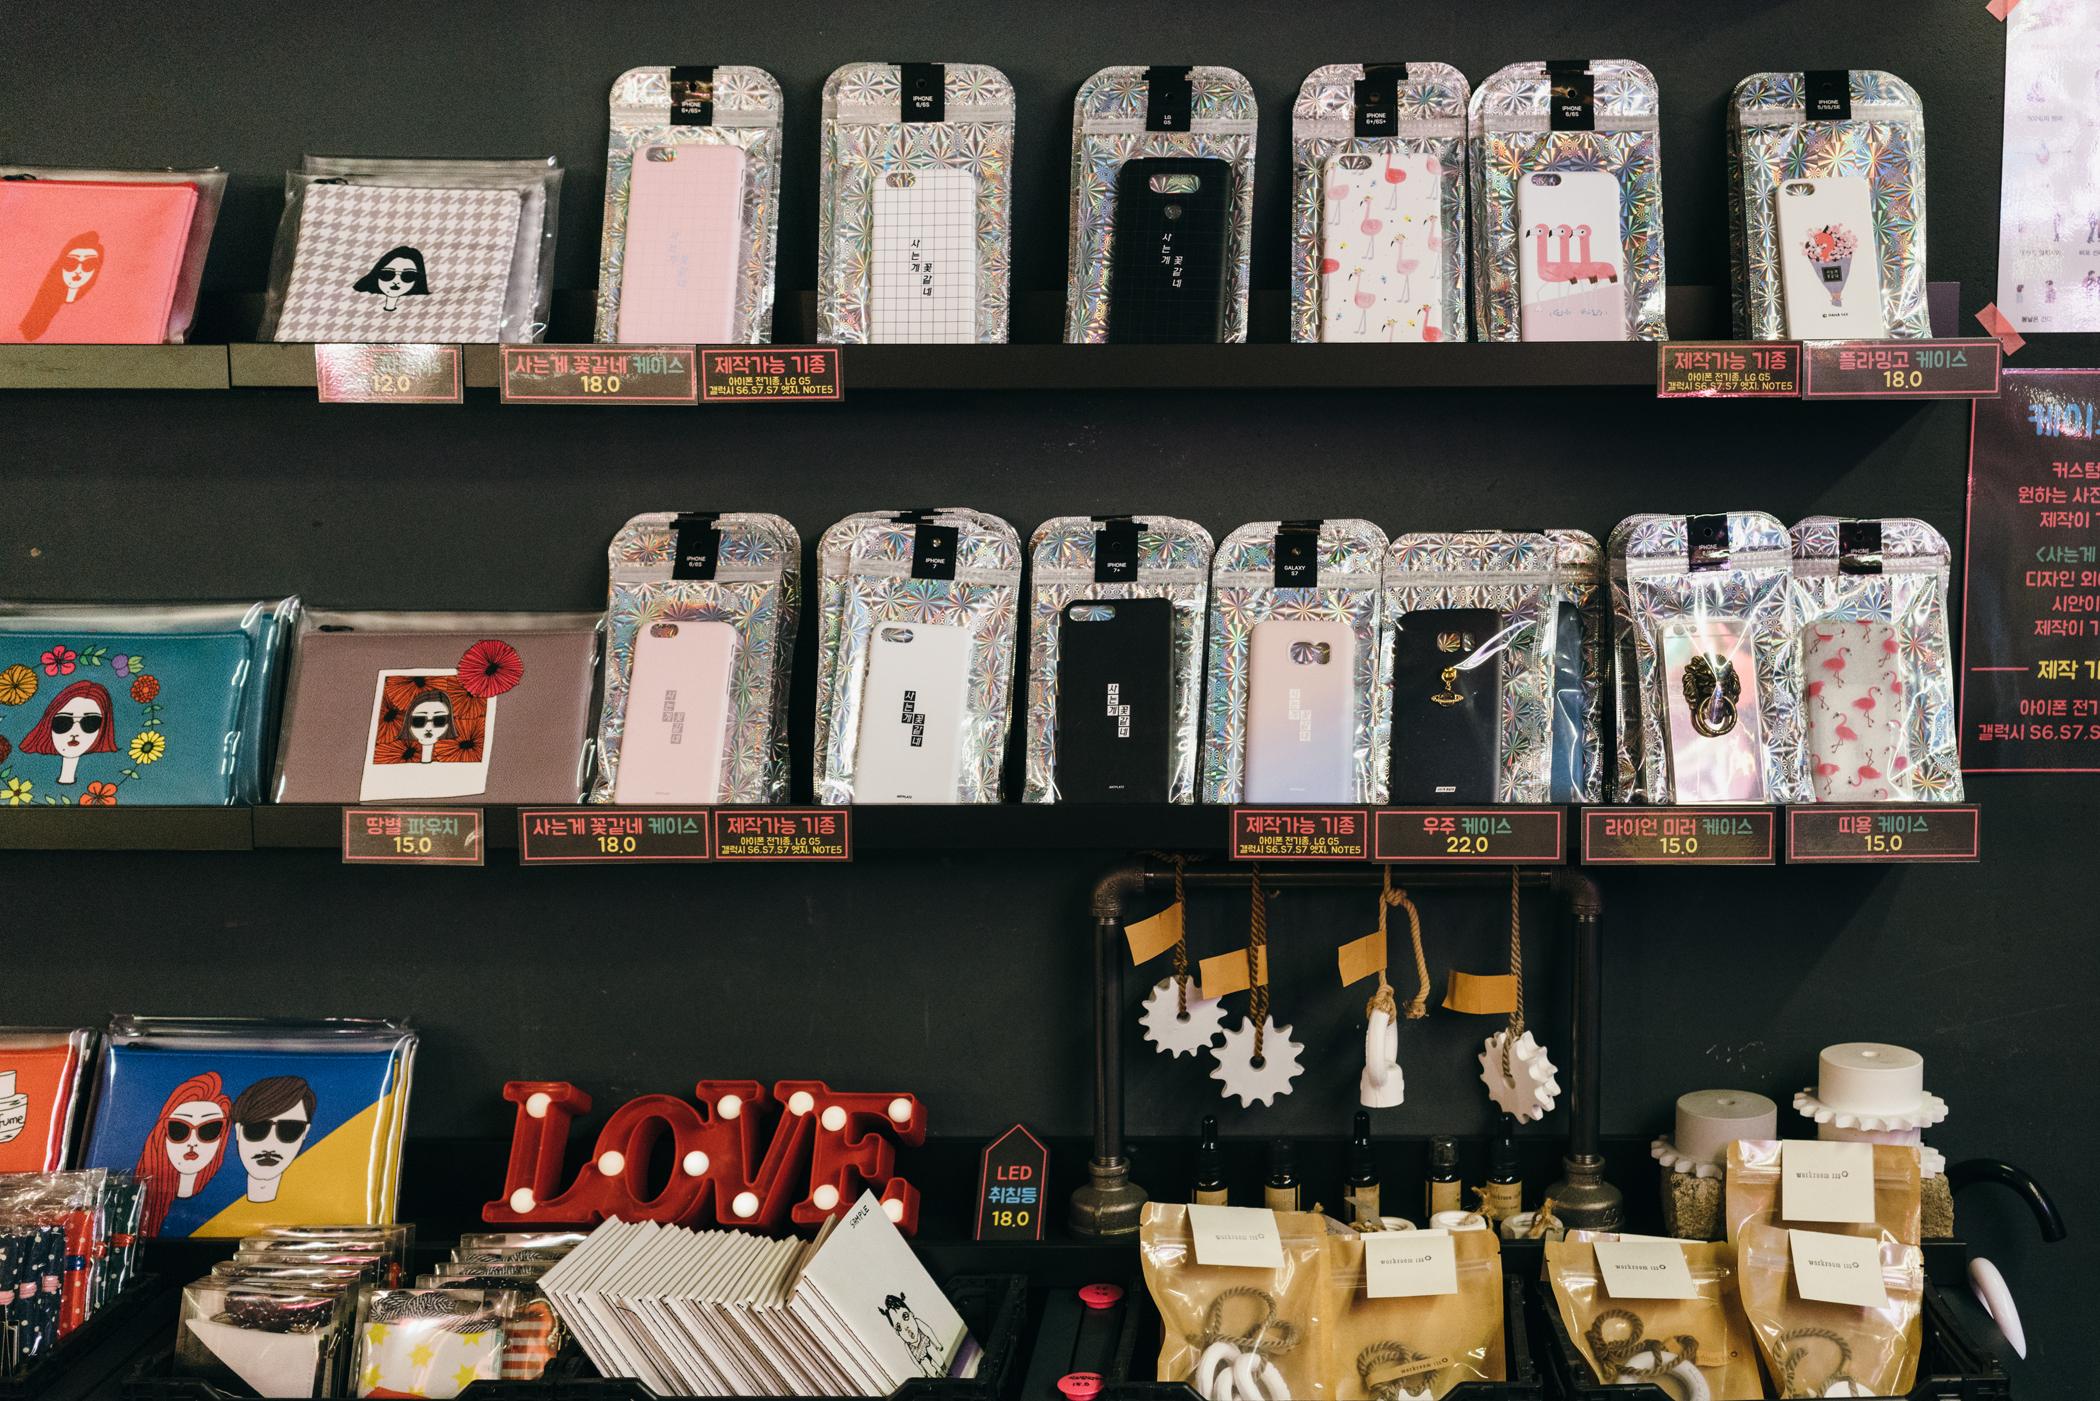 Greysuitcase Seoul Shops Series: Art Platz (사는게꽃같네 아트플라츠), Yeonnam-dong (연남동), Seoul, South Korea.